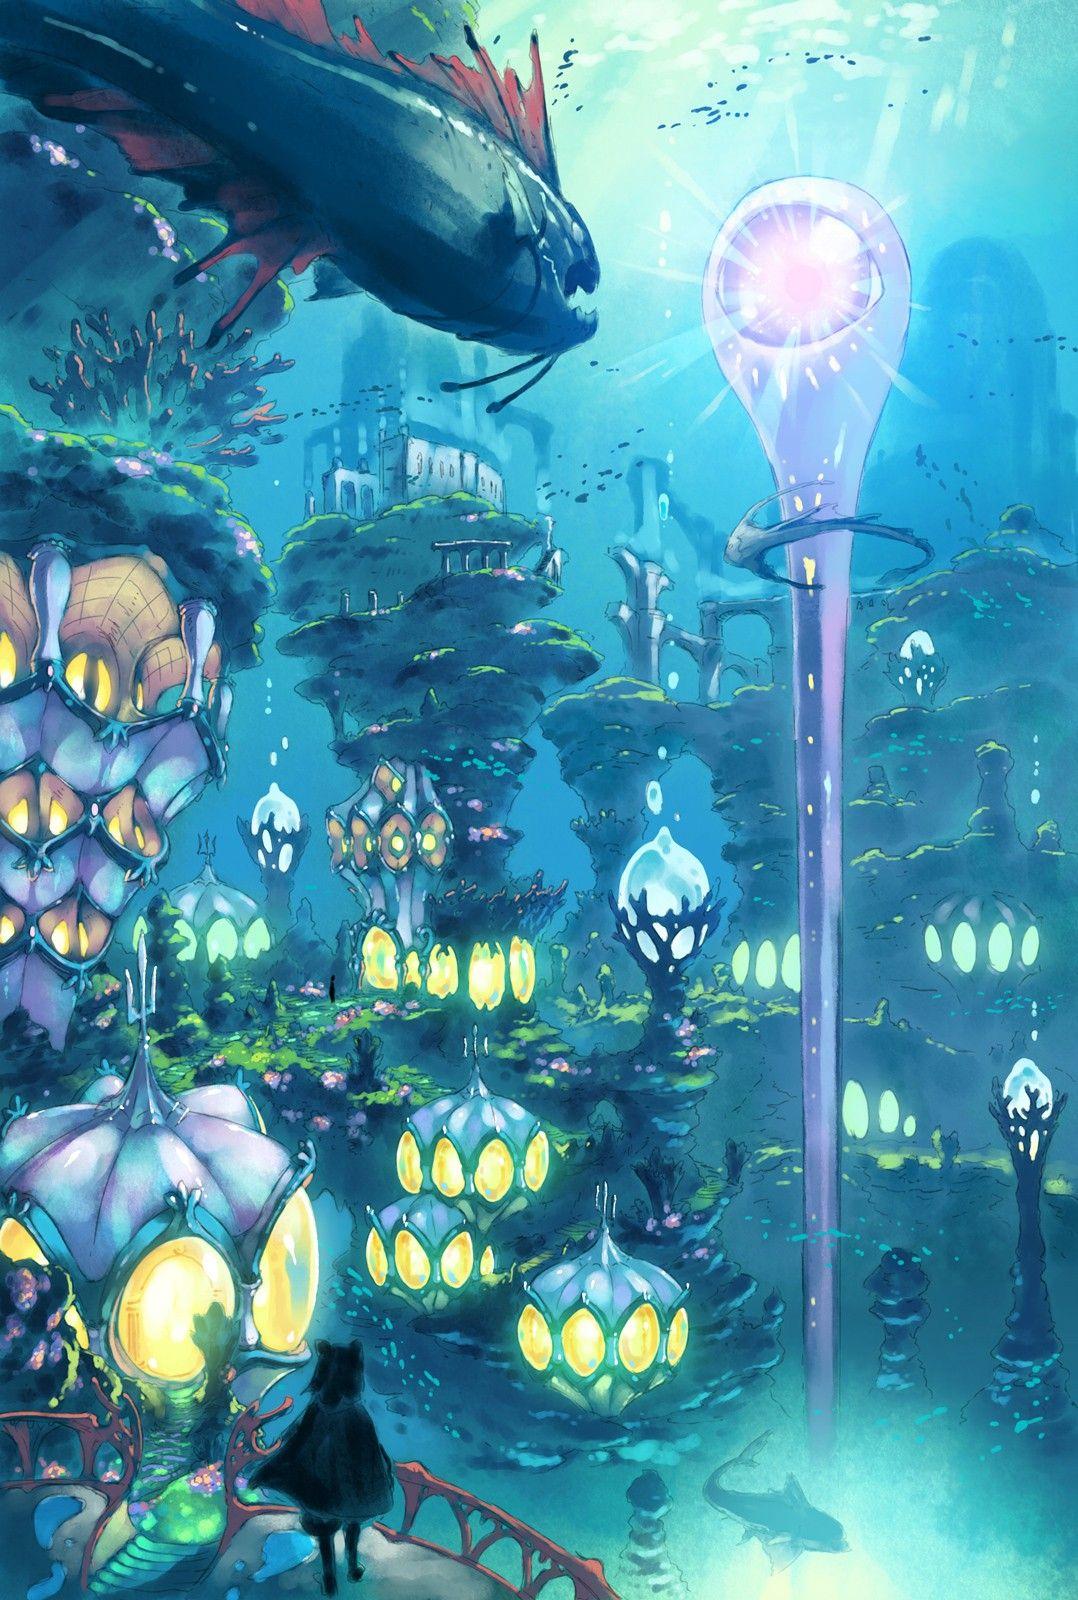 Artwork Hydropolis Ni No Kuni Ii Level 5 Artwork Fantasy